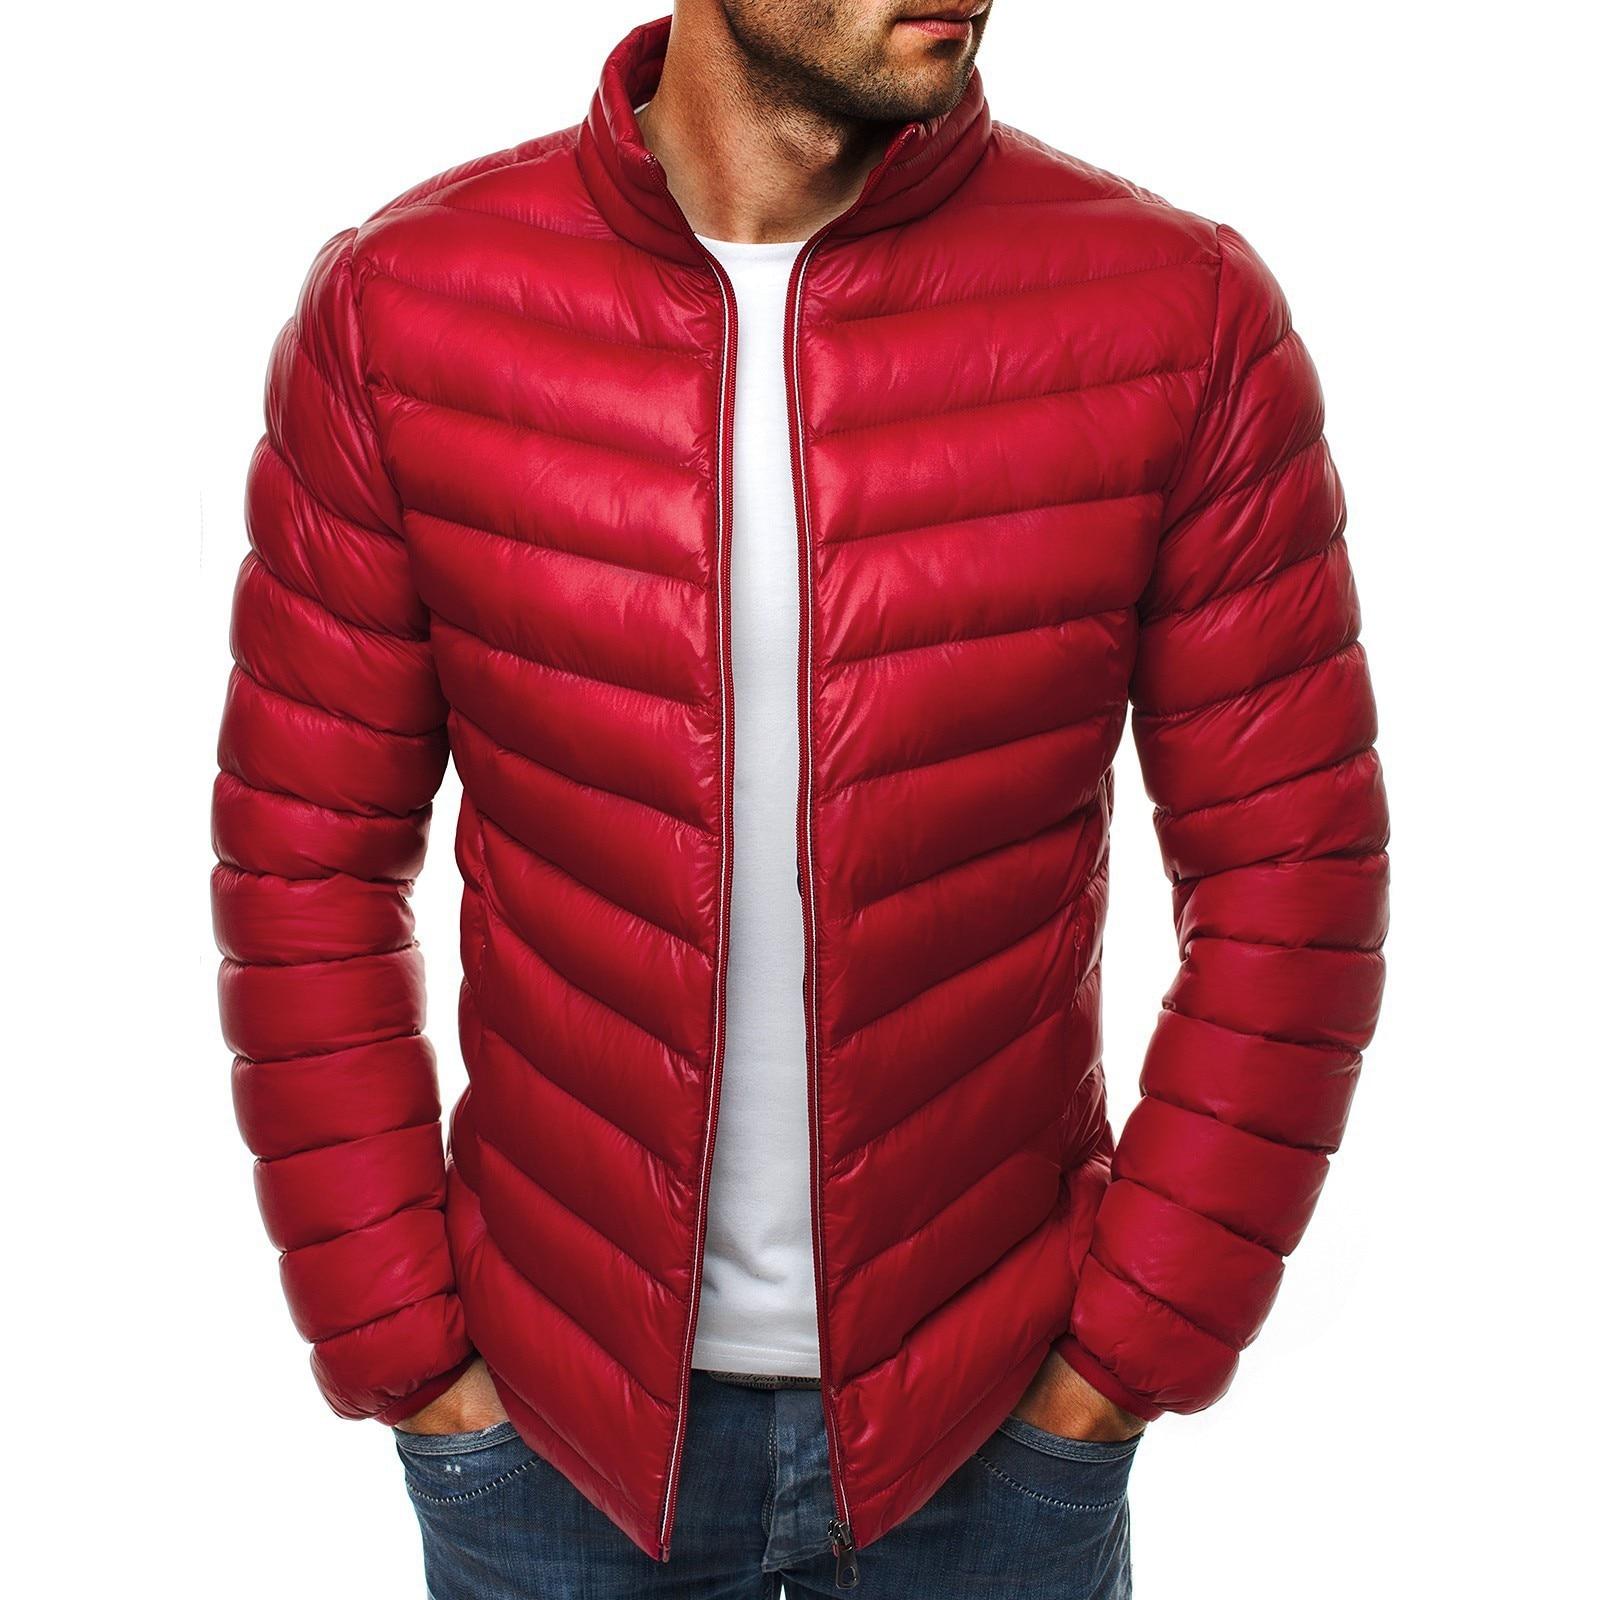 Mens Cotton Coat Winter Jacket Men Jackets and Coats  Parka Parkas